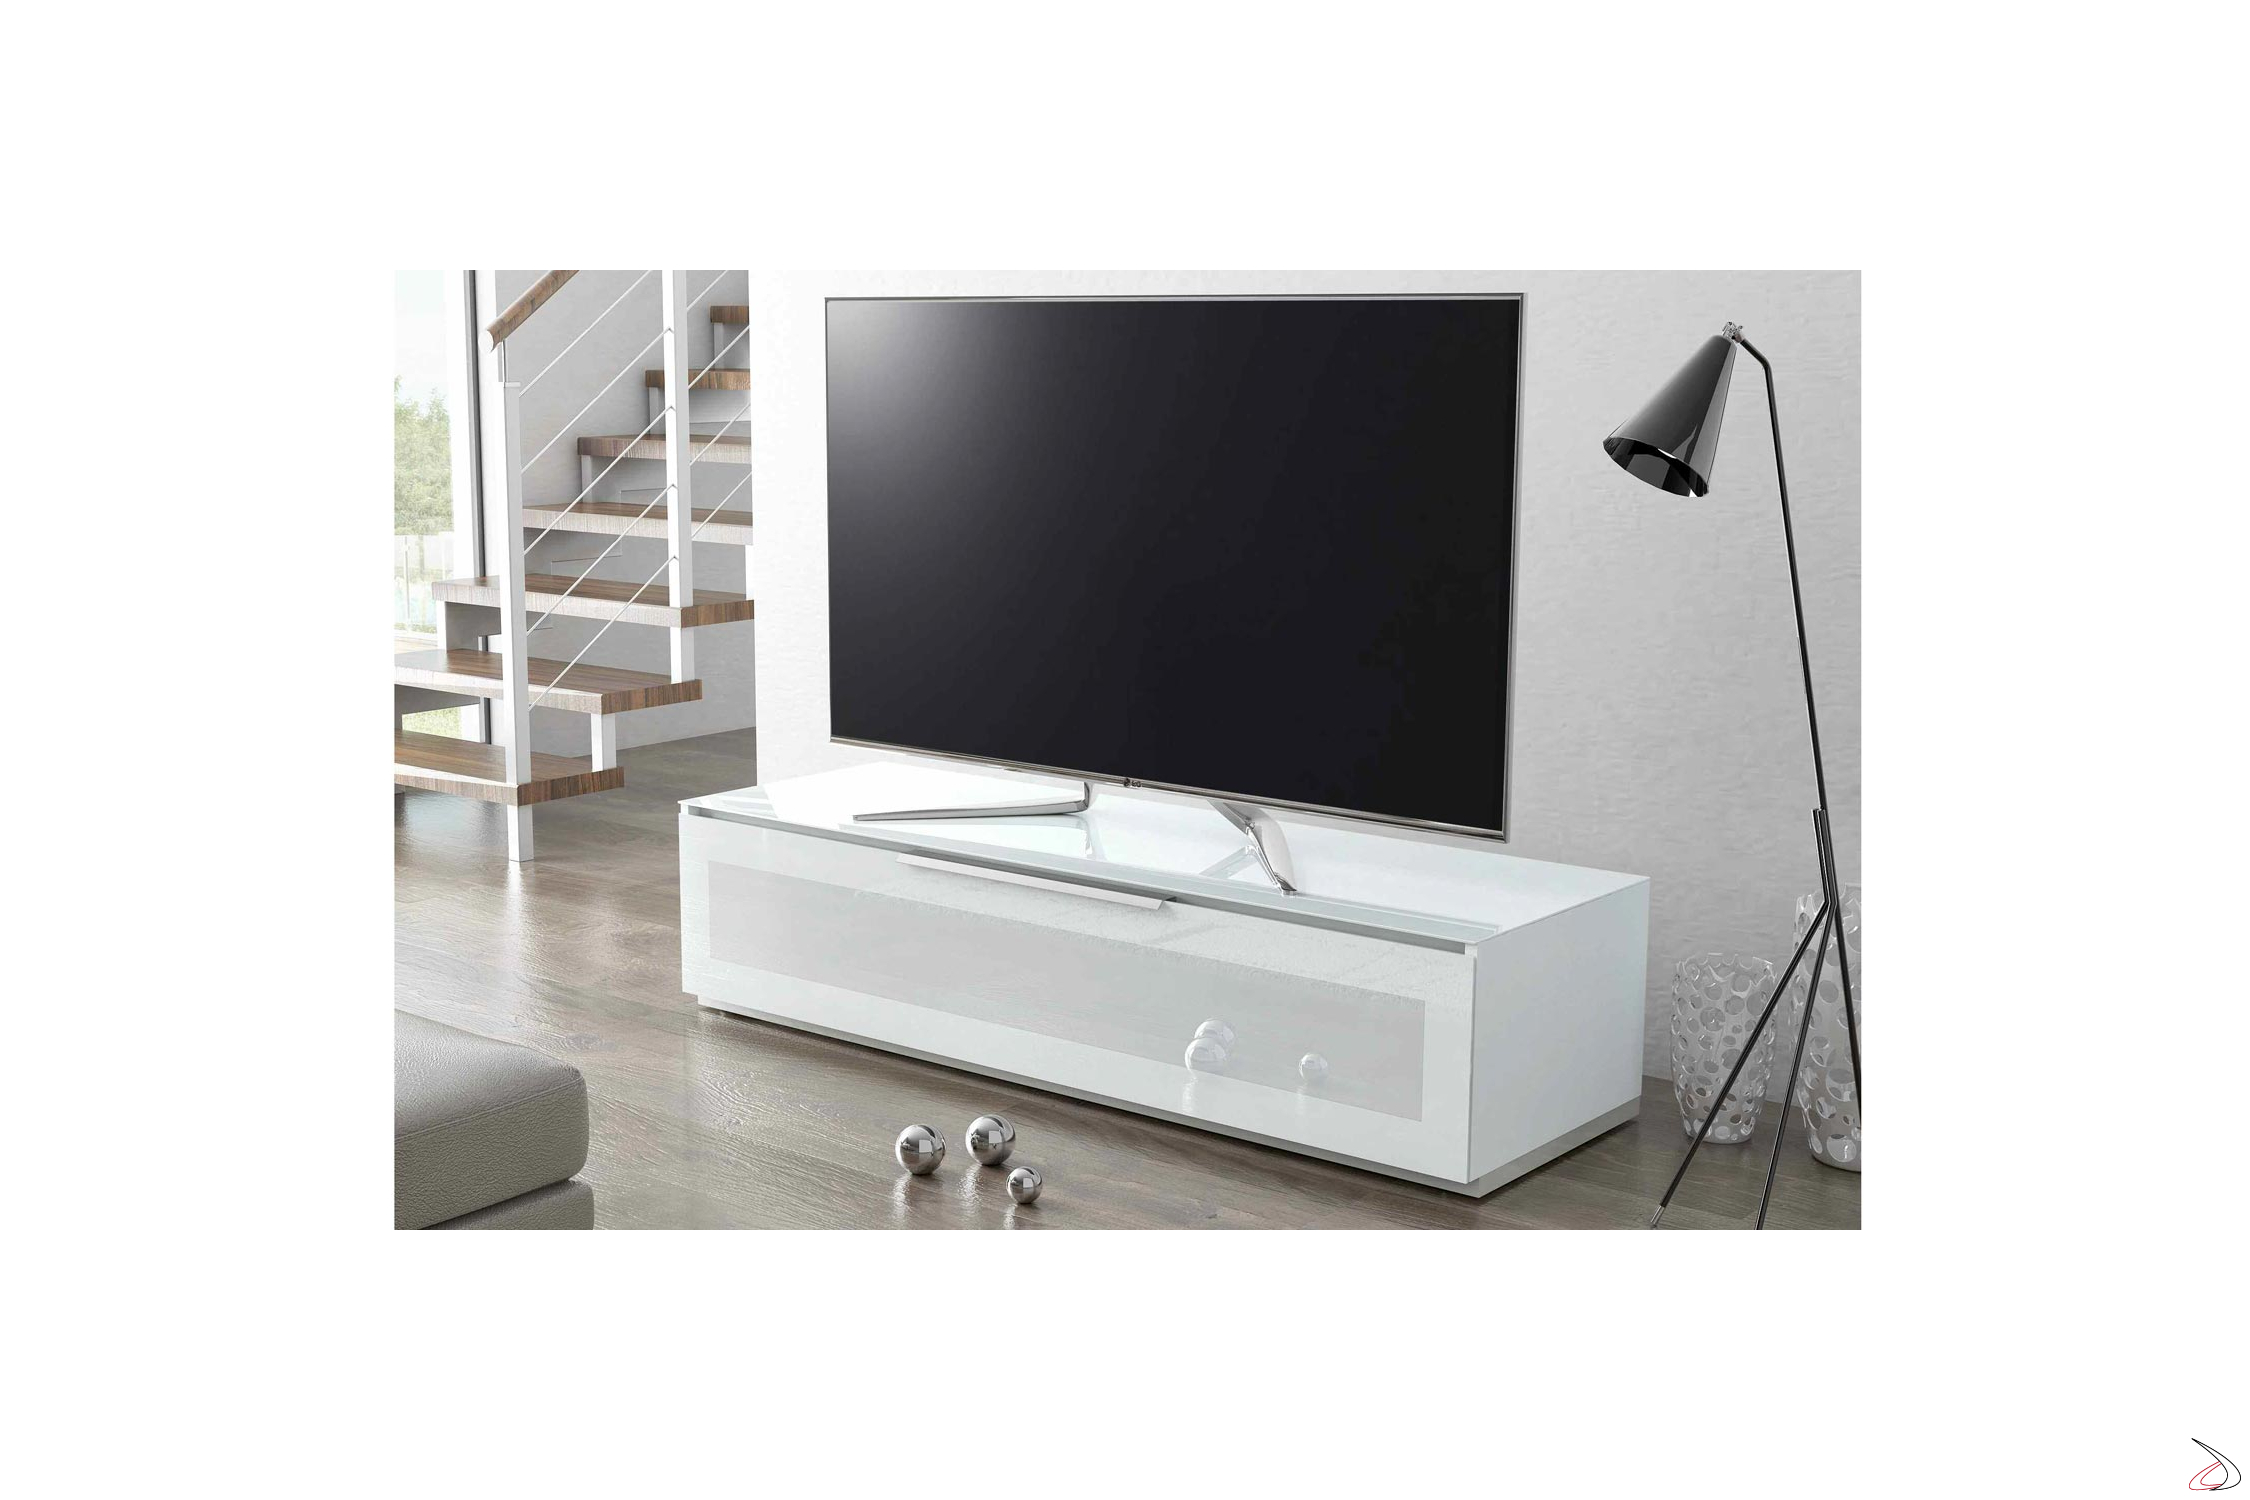 Mobili Porta Tv Munari Prezzi.Mobile Porta Tv Design Garda Di Munari Toparredi Arredo Design